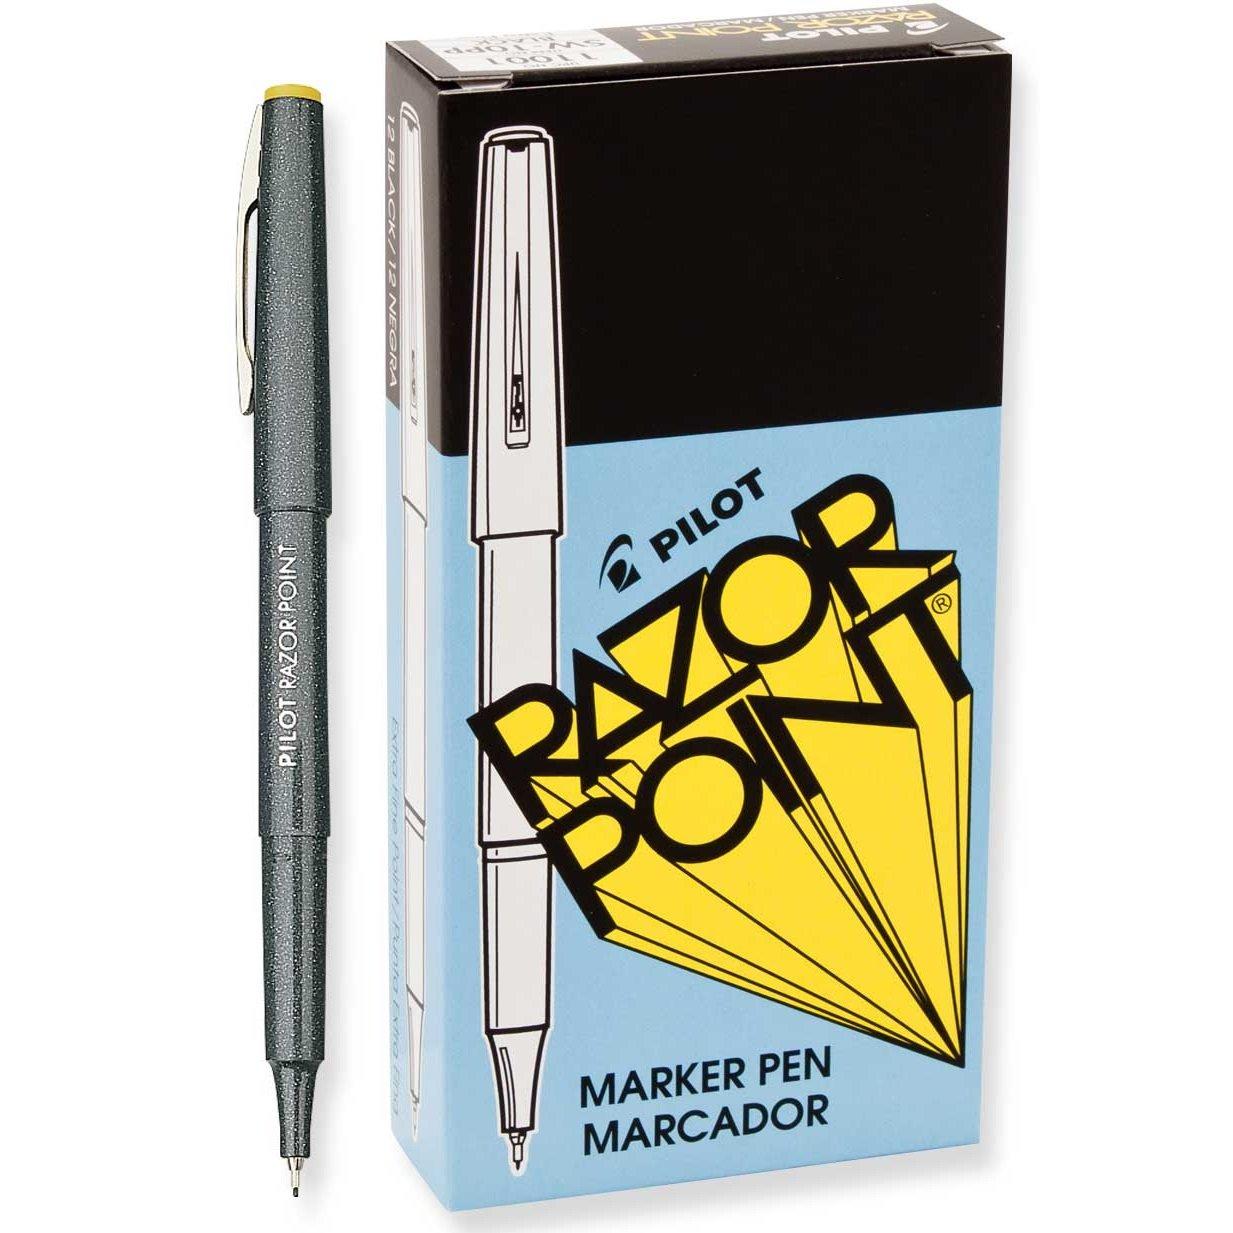 Pilot Razor Point Pens, Extra-Fine Point, 0.3 mm, Black Barrel, Black Ink, Pack of 12 Pens by Pilot